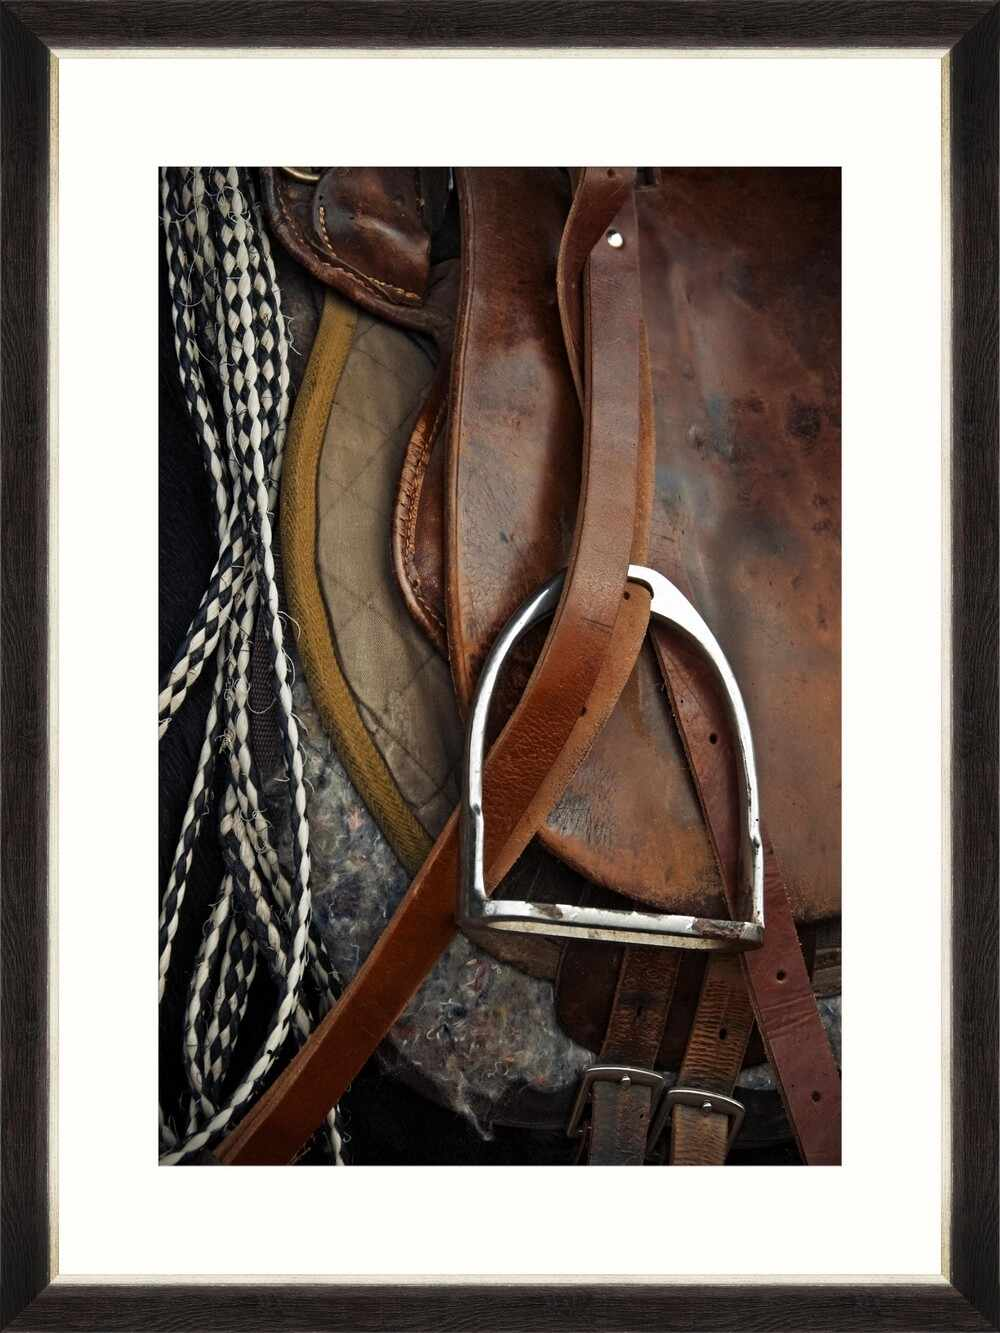 Tablou Framed Art Equitation III la pret 395 lei